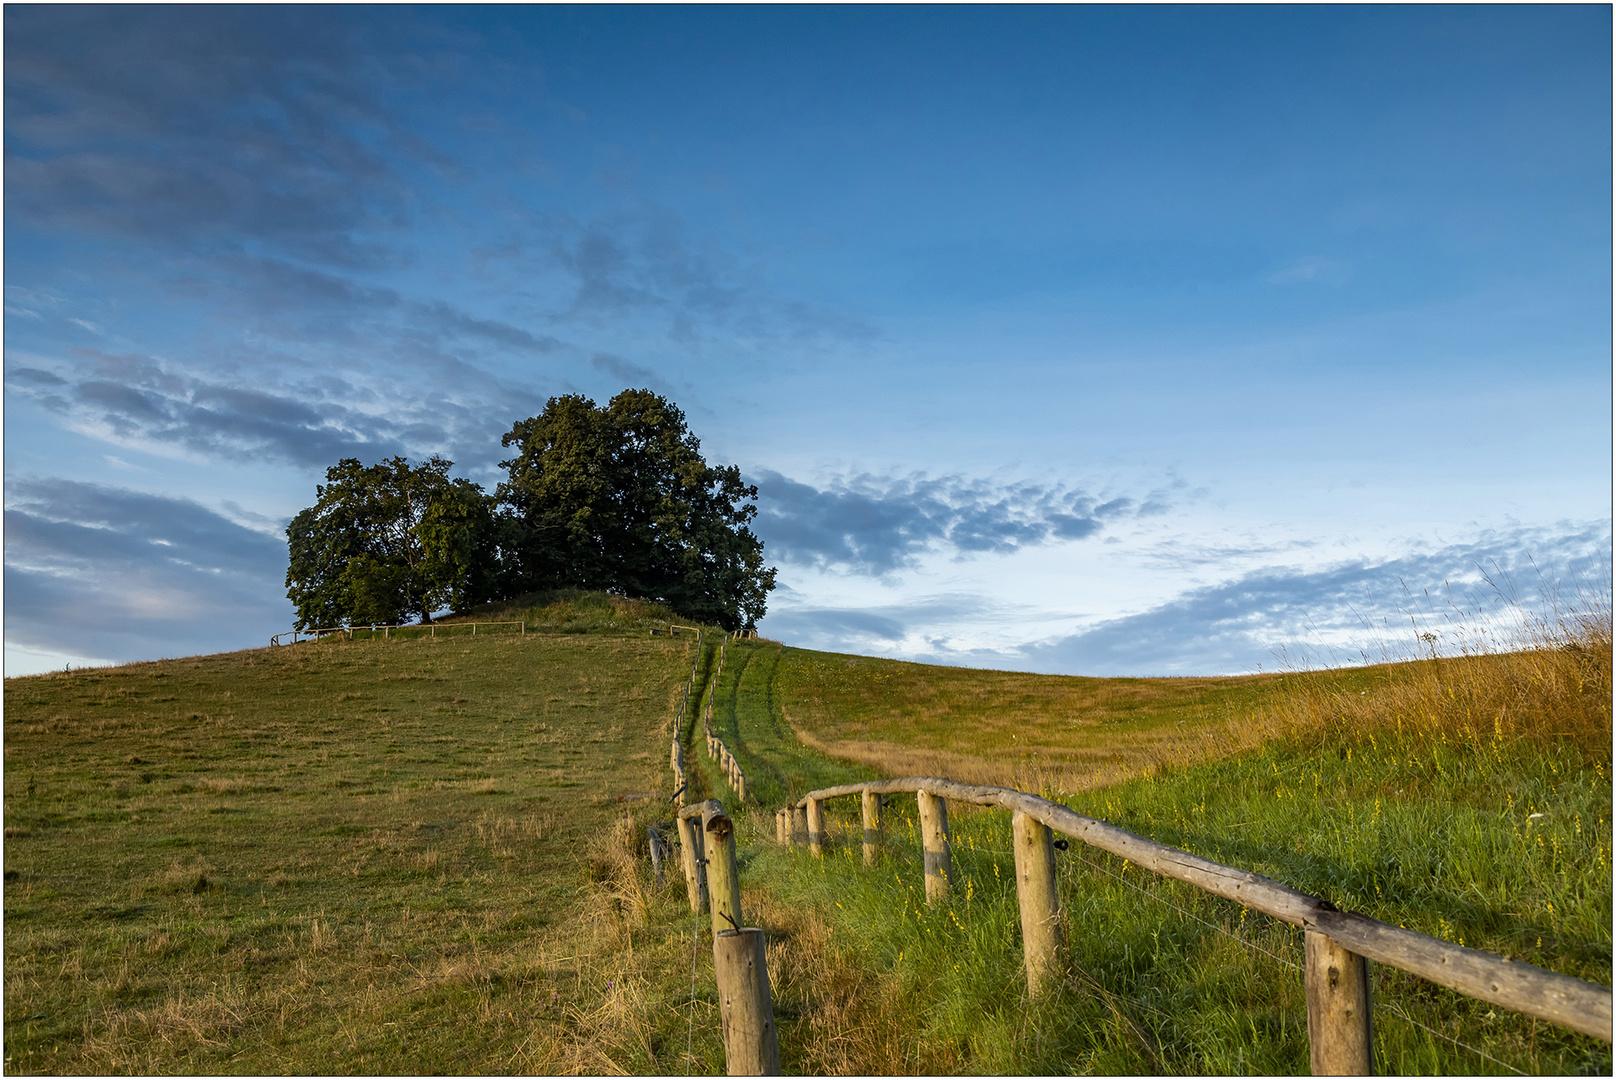 Hügelgrab bei Wustrow